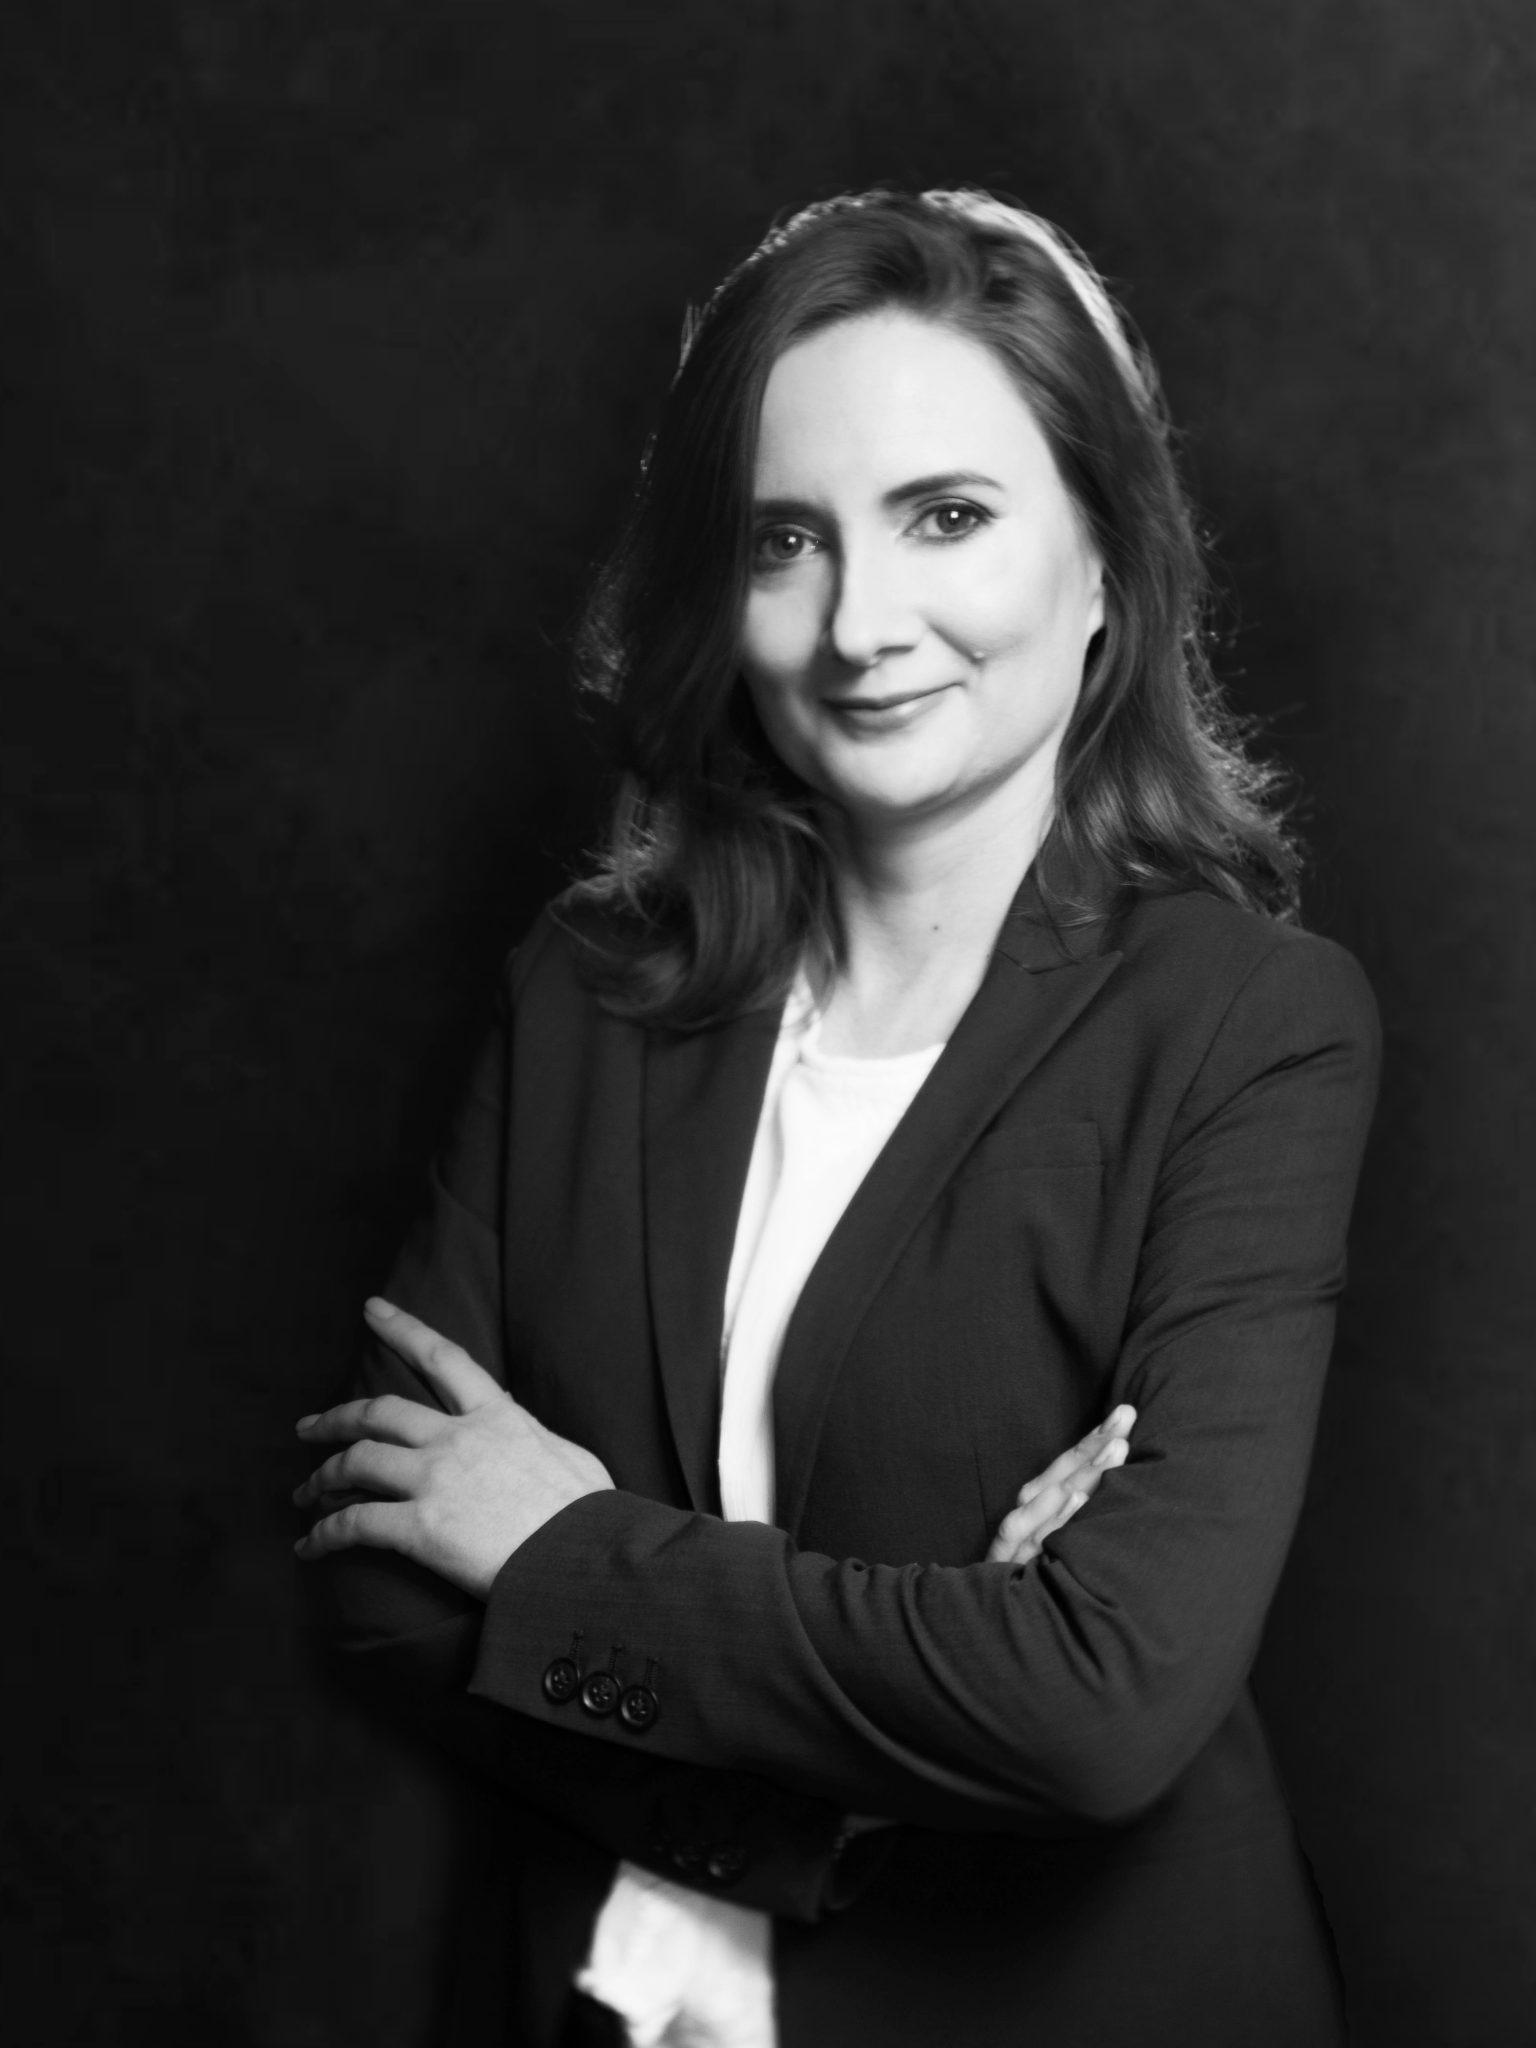 English speaking lawyer in Krakow, Poland